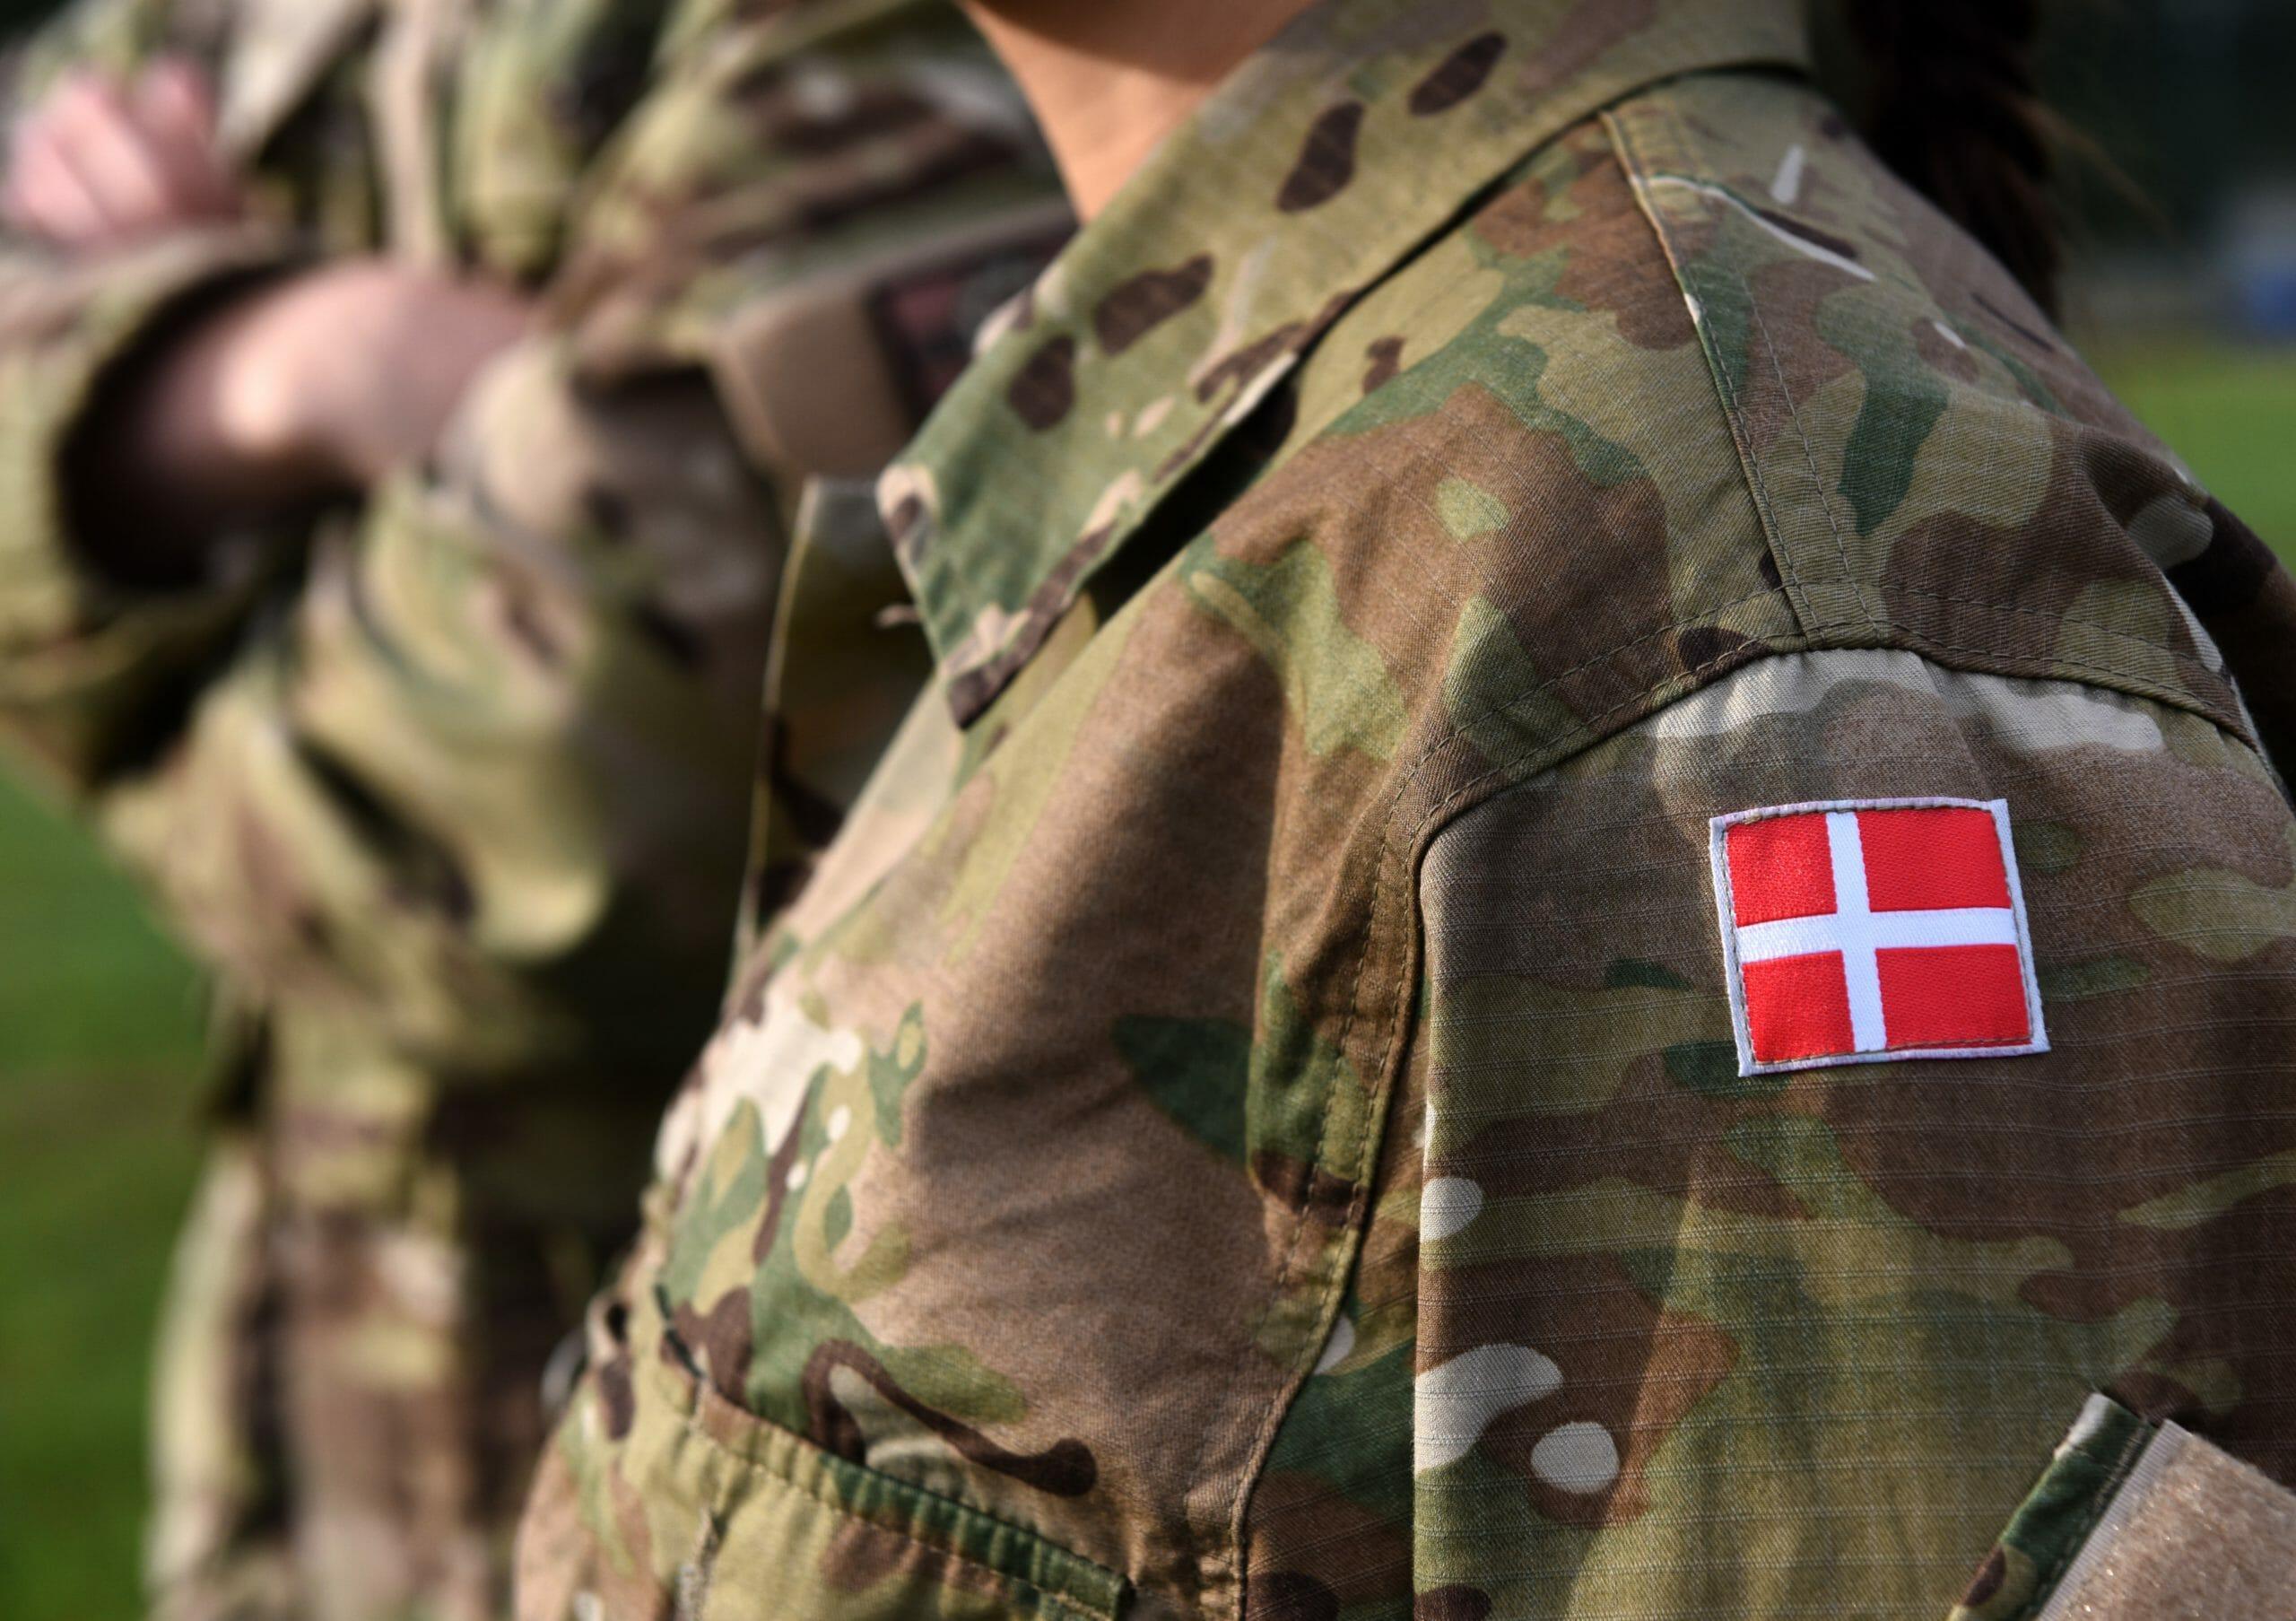 FAKTA: Danmark skal stå i spidsen for Nato-mission i Irak